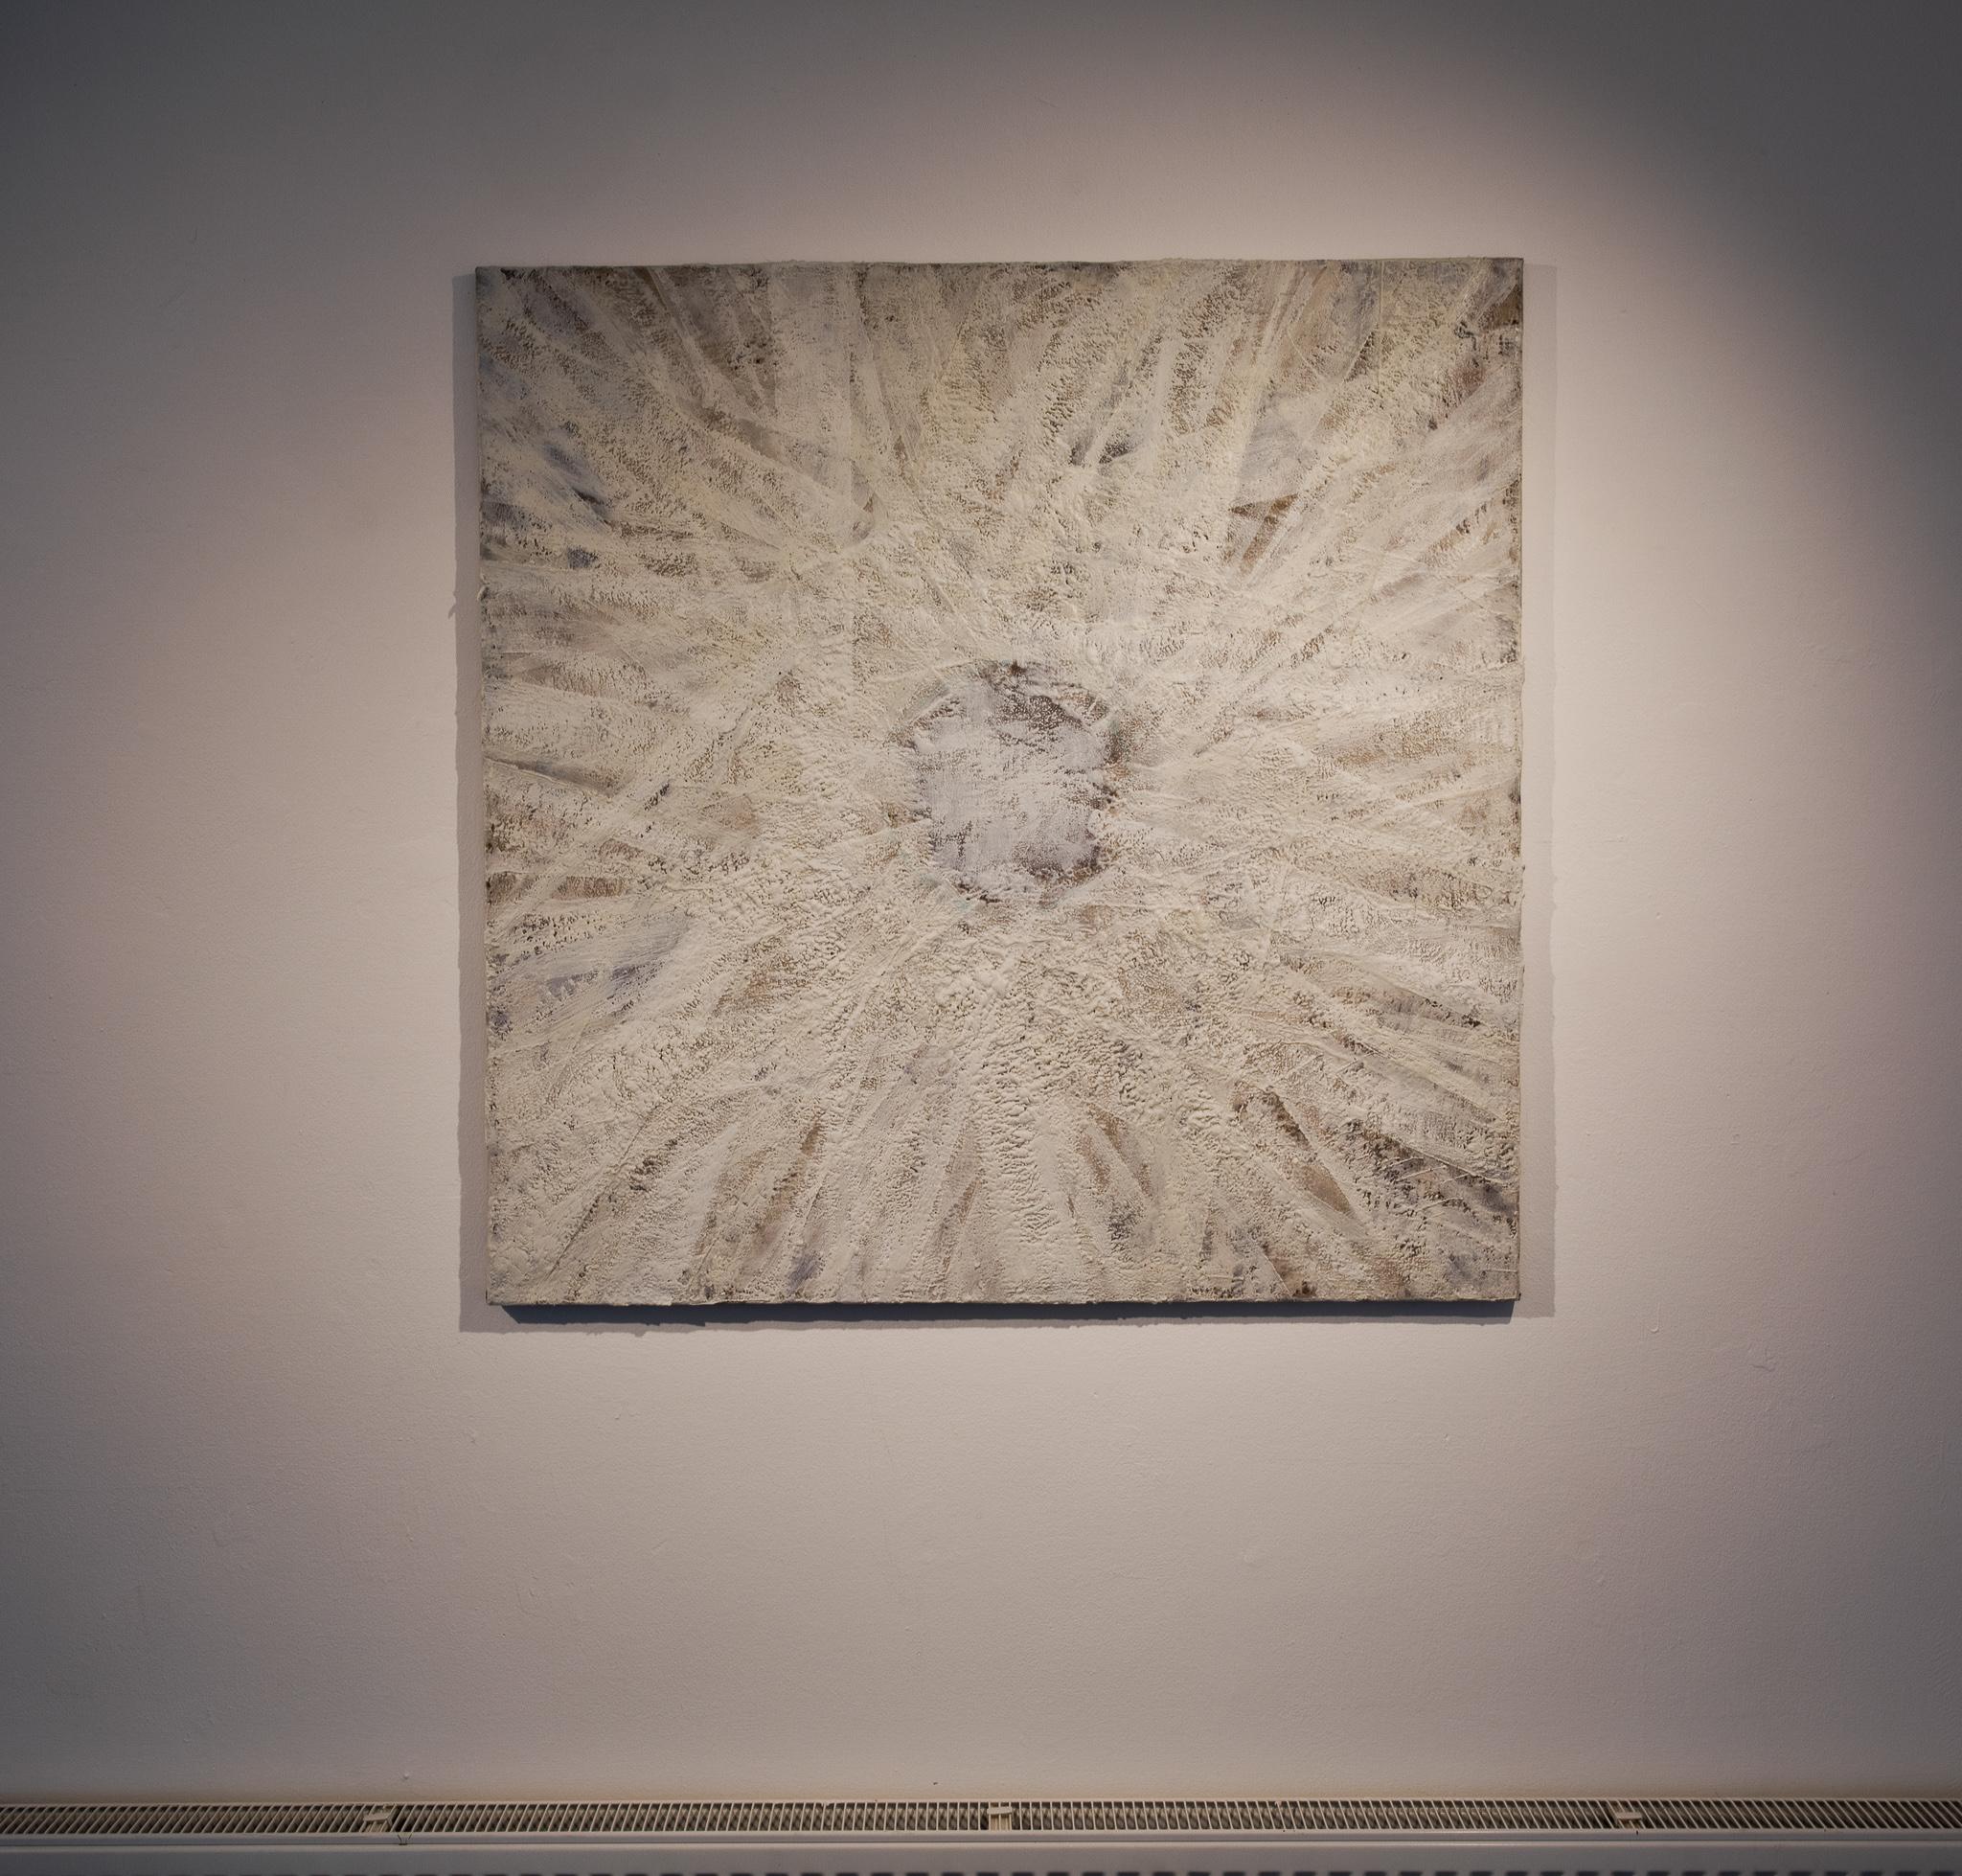 Helen Comerford, Post 19, II, 2021 - Encaustic painting on linen - 100x100cm - €4,000